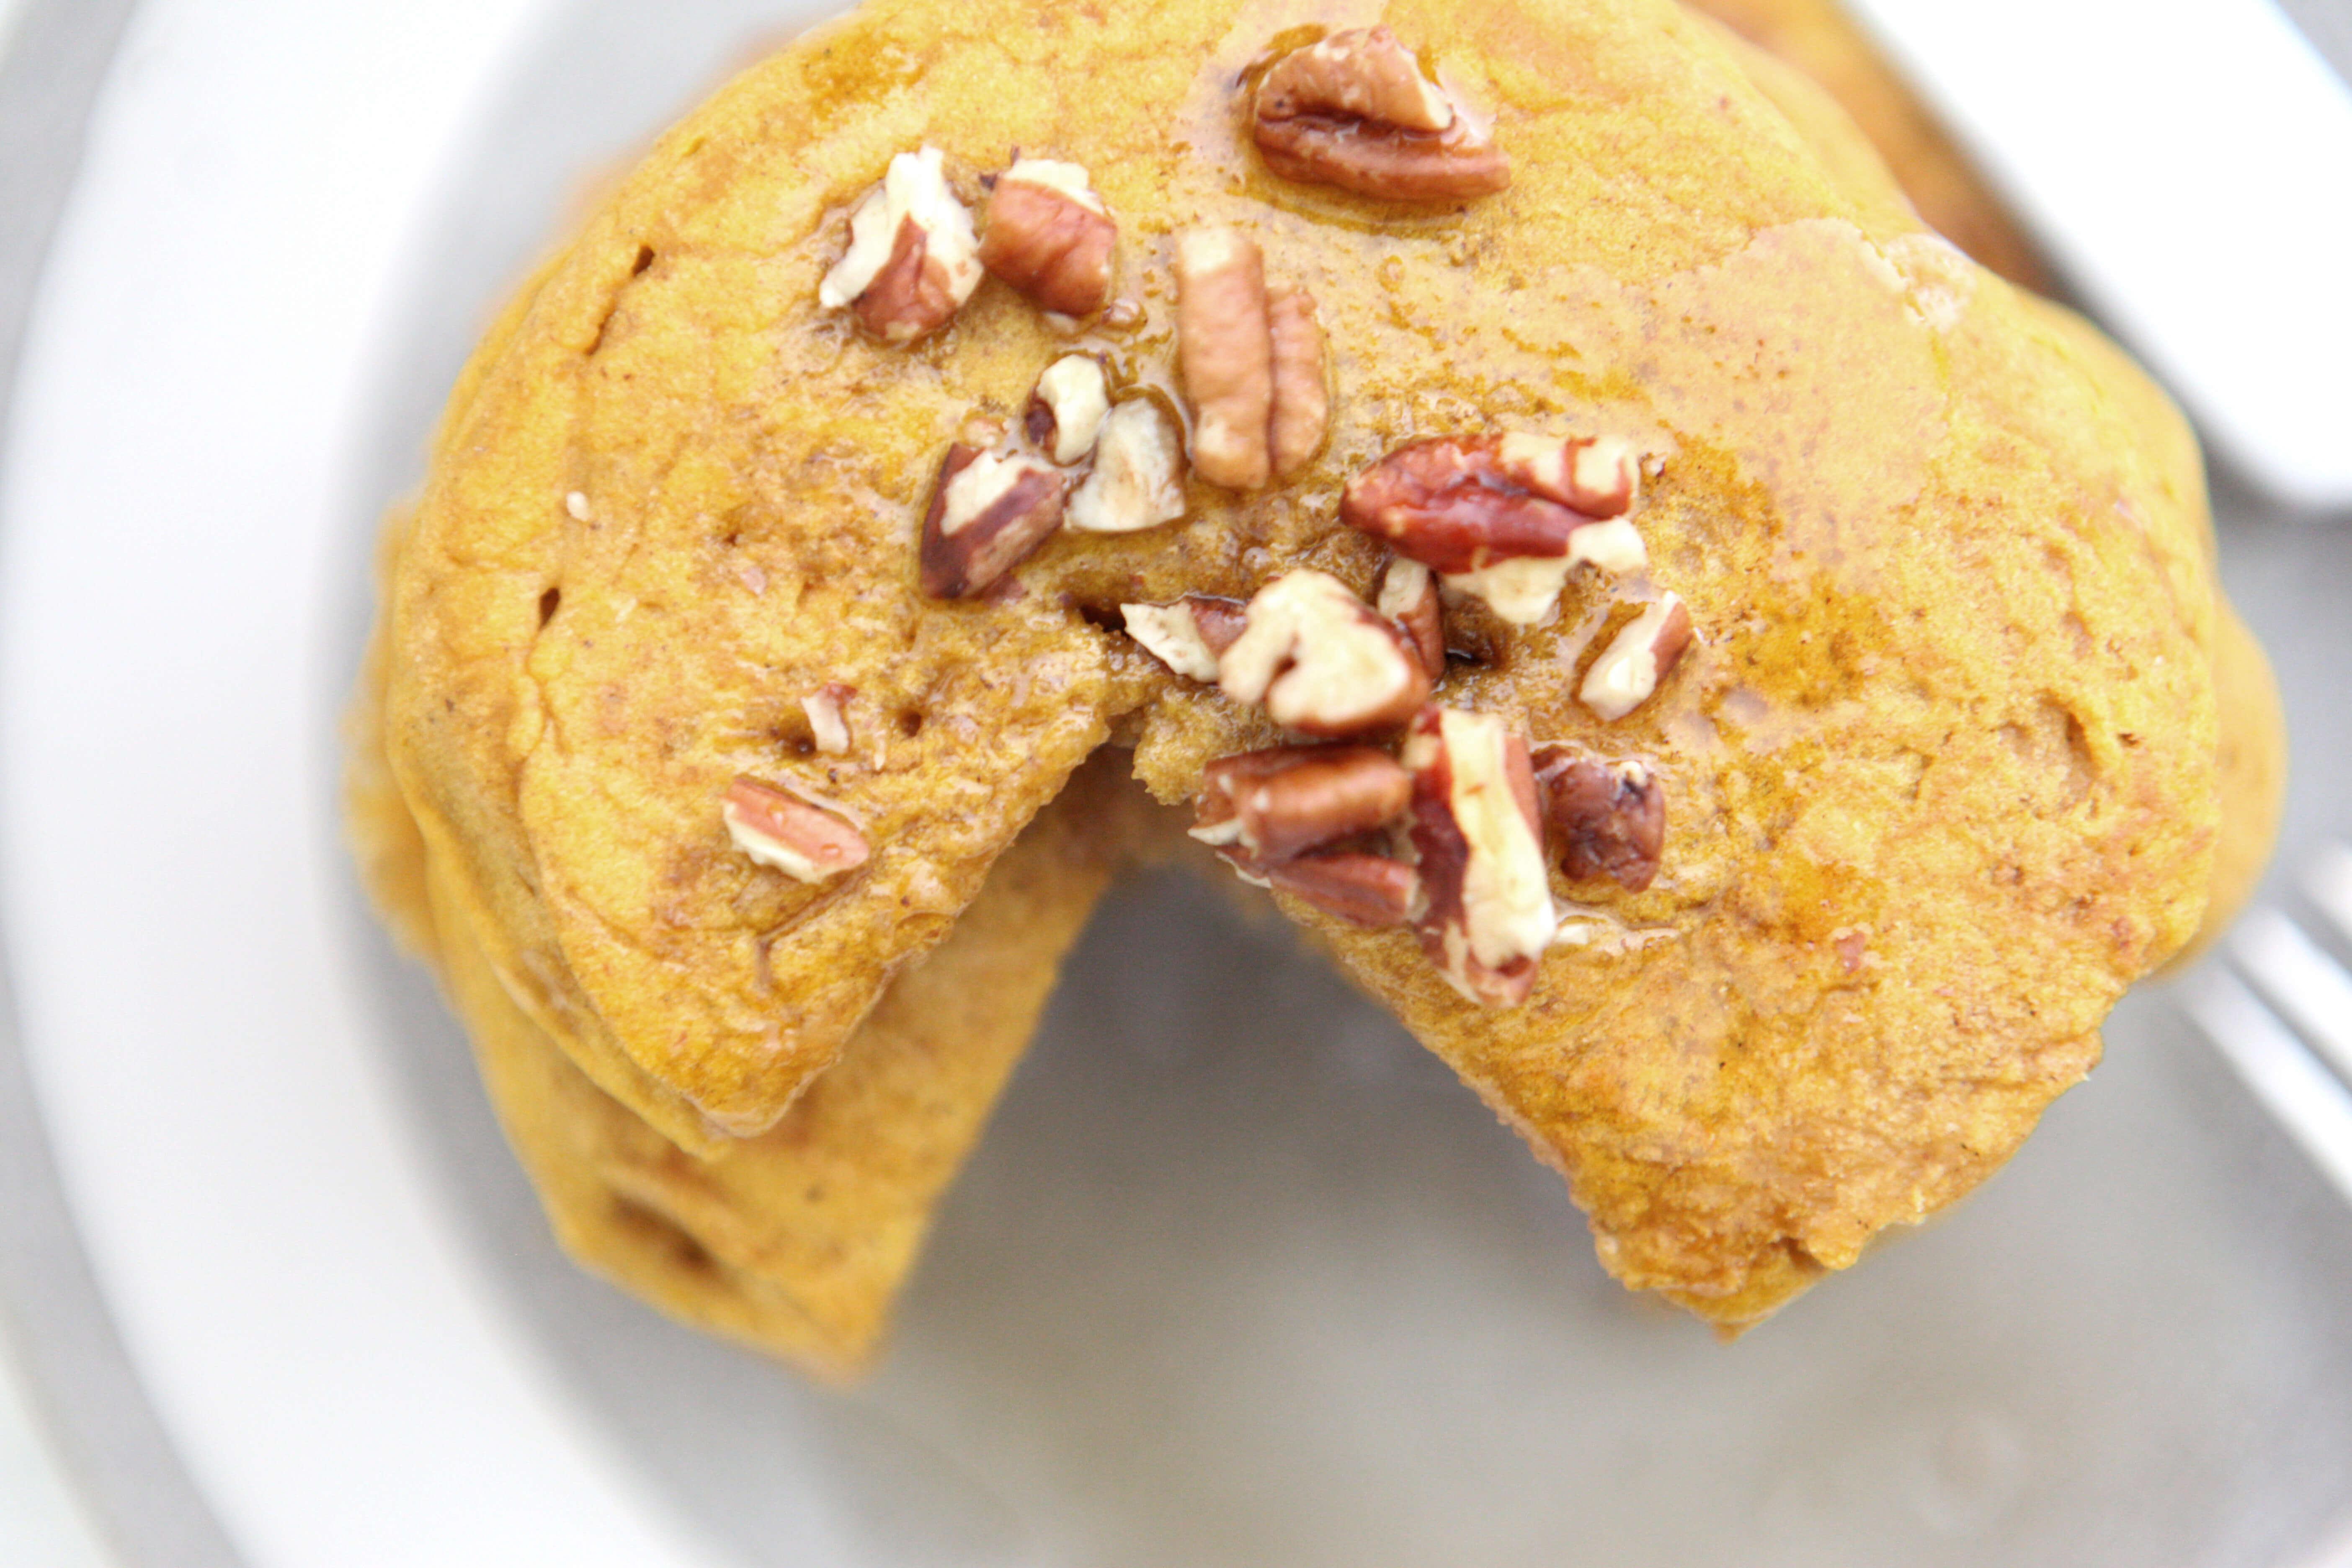 Gluten Free Recipe Roundup Nine www.sarahkayhoffman.com #healthyliving #recipes #glutenfree #dairyfree #veganrecipes Pumpkin Maple Pancakes #pancakes